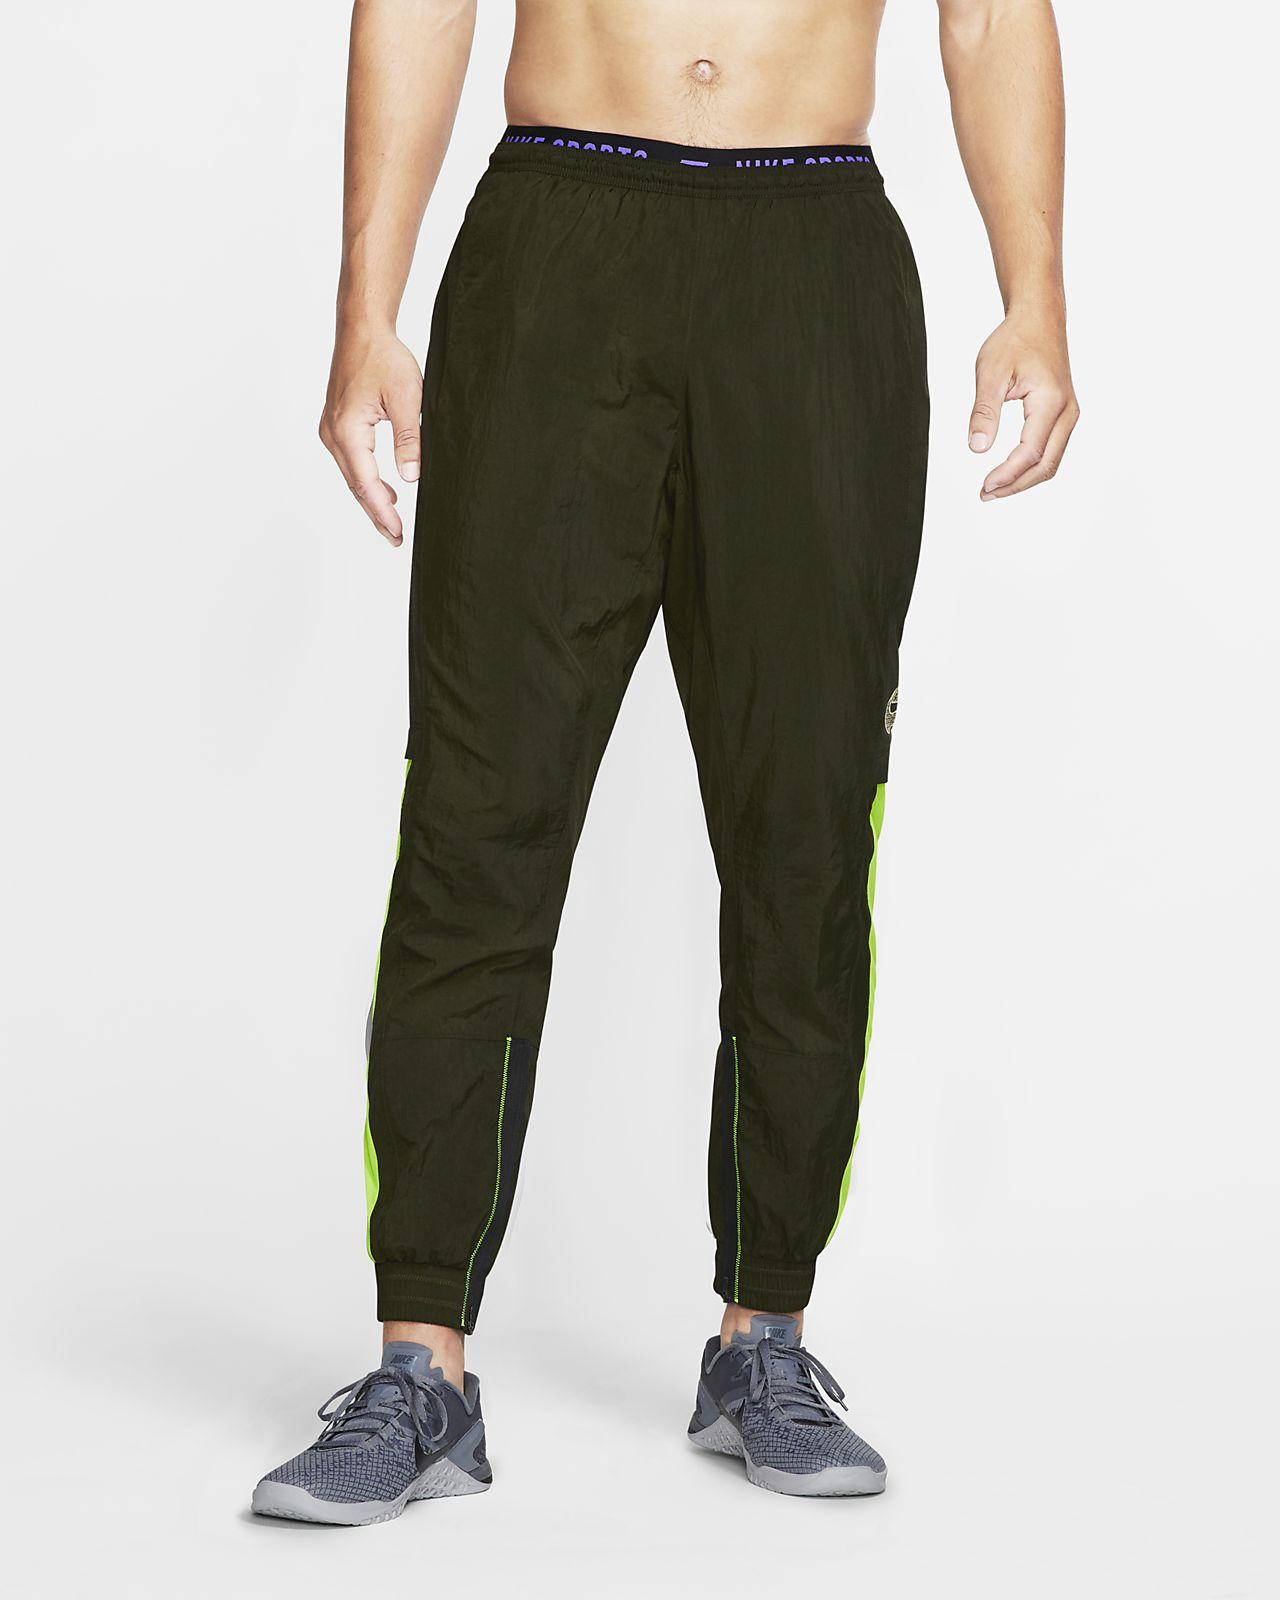 Pantaloni da training Nike Dri-FIT Flex - Uomo